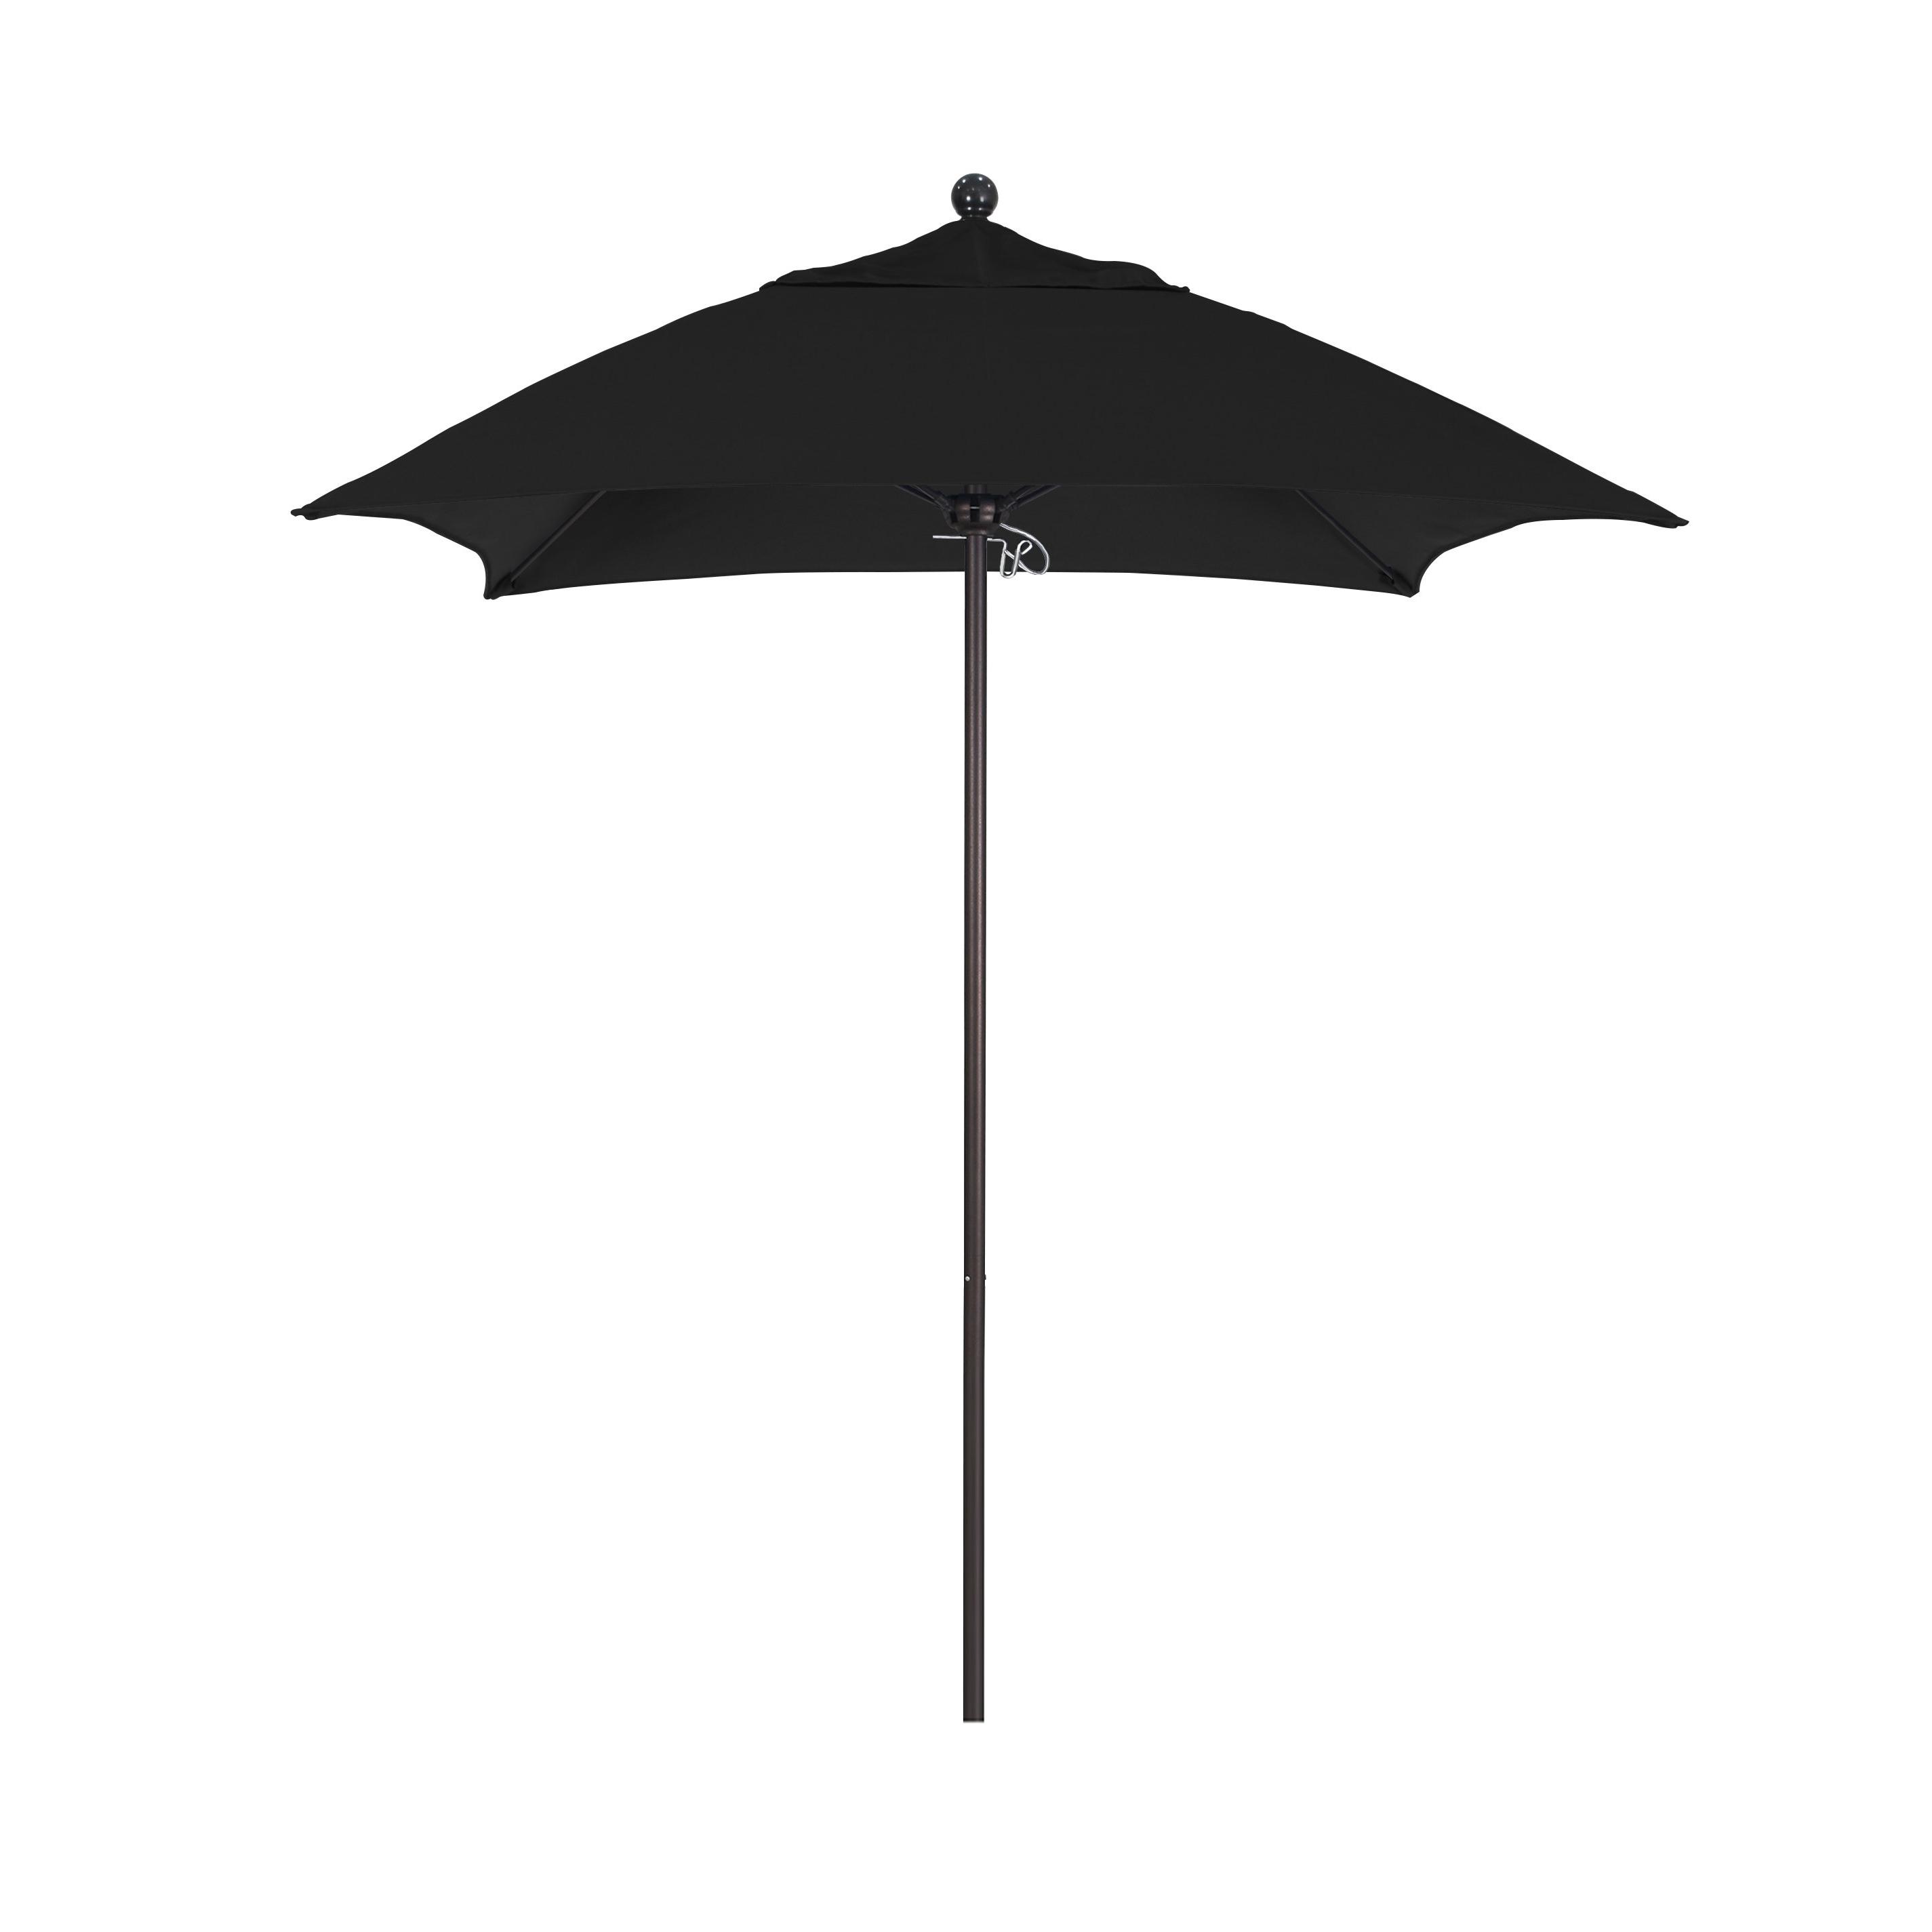 Famous Caravelle Square Market Sunbrella Umbrellas Pertaining To Benson 6' Square Market Sunbrella Umbrella (View 3 of 20)